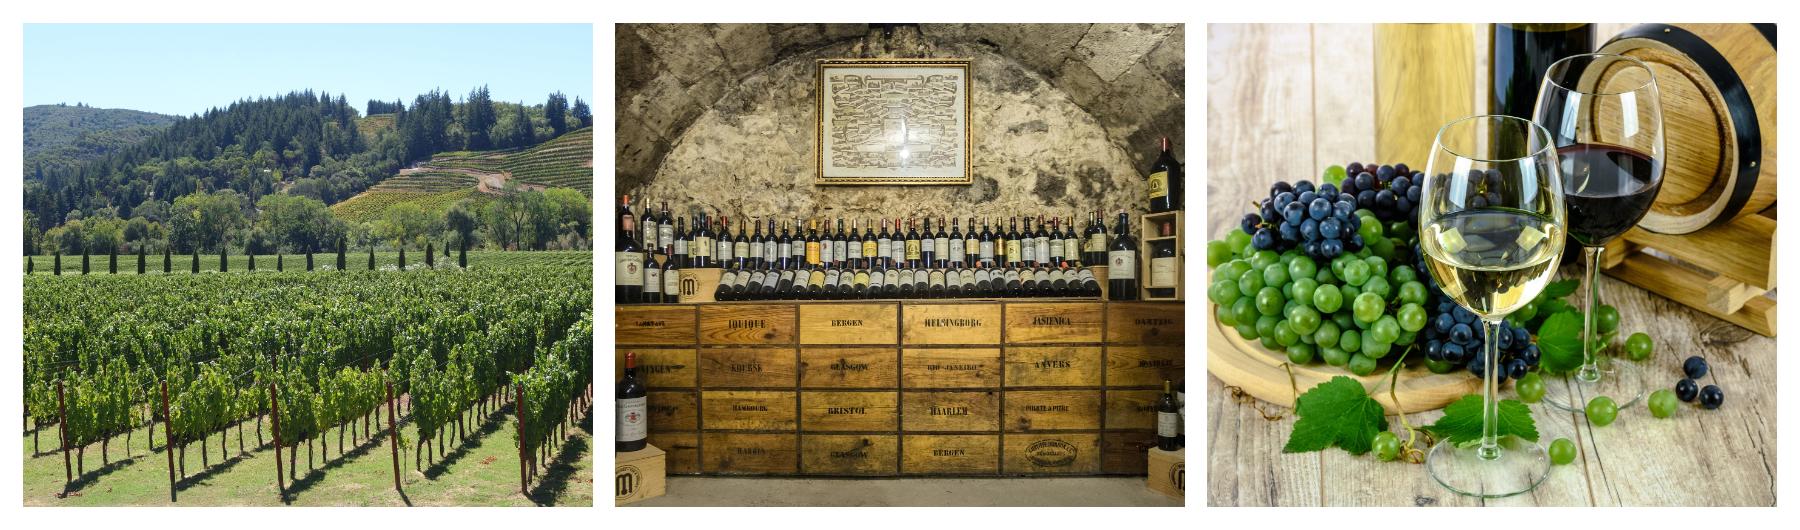 TCD Alumni Luxembourg - Winery Tour